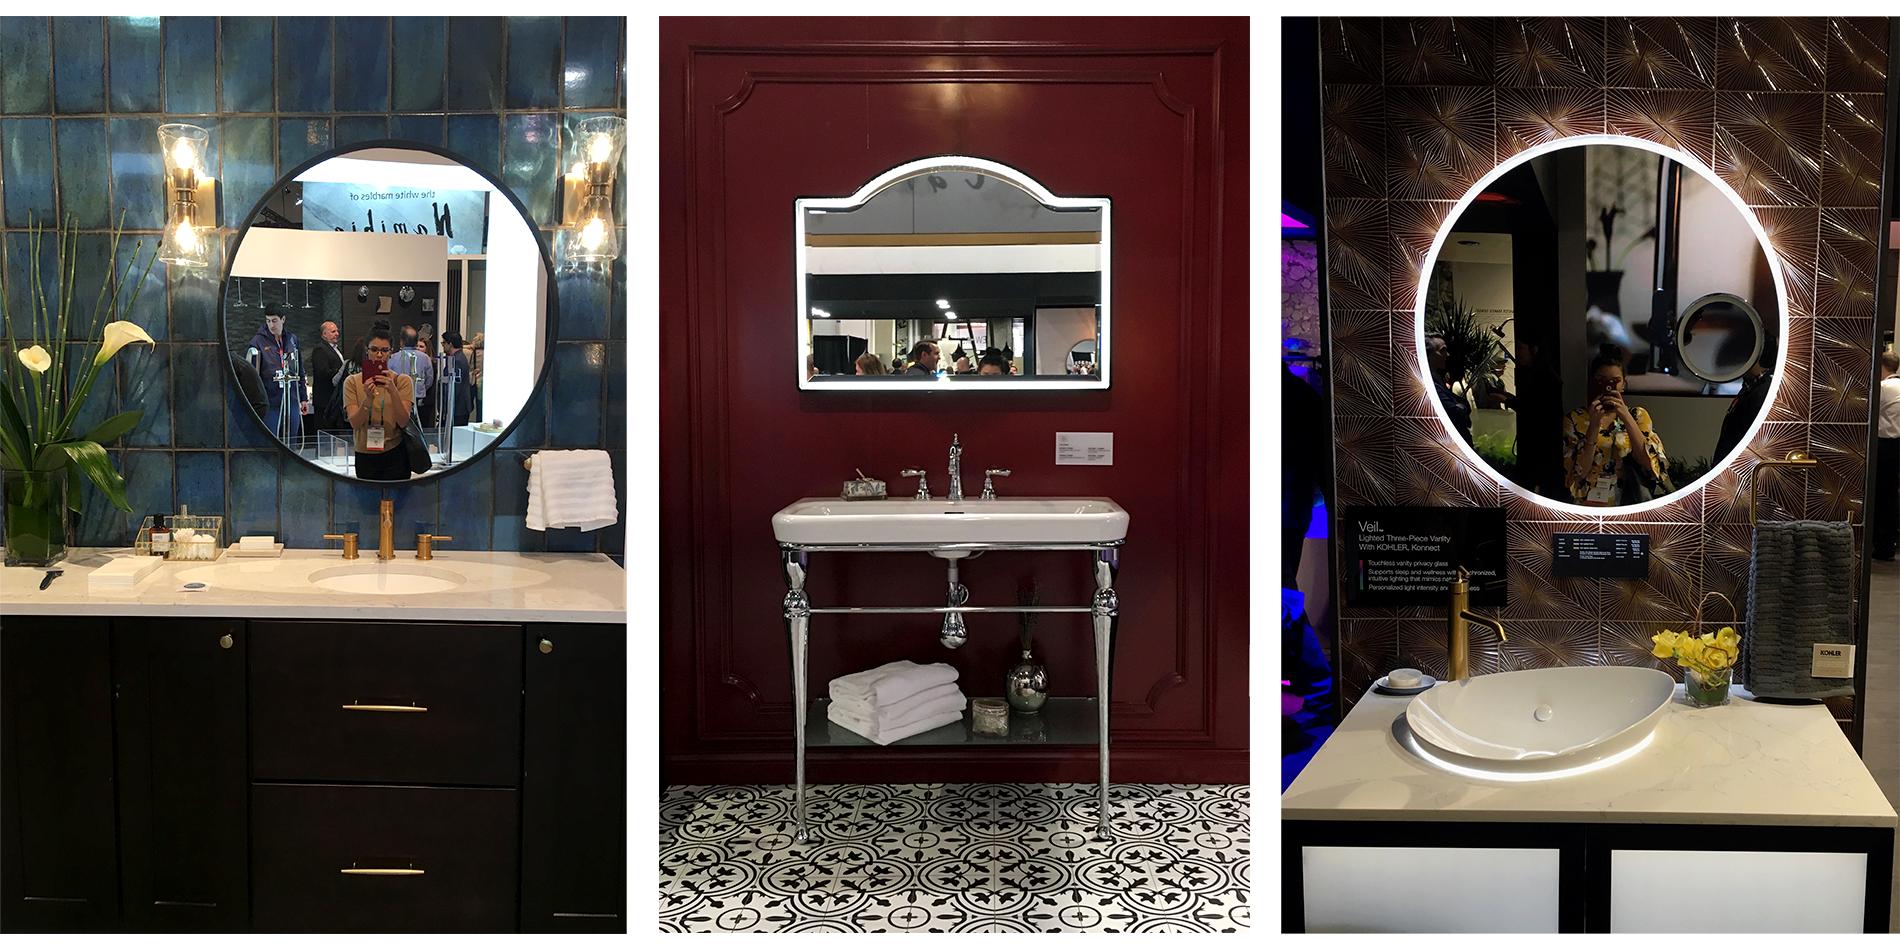 kbis-mirror-vanity-collage